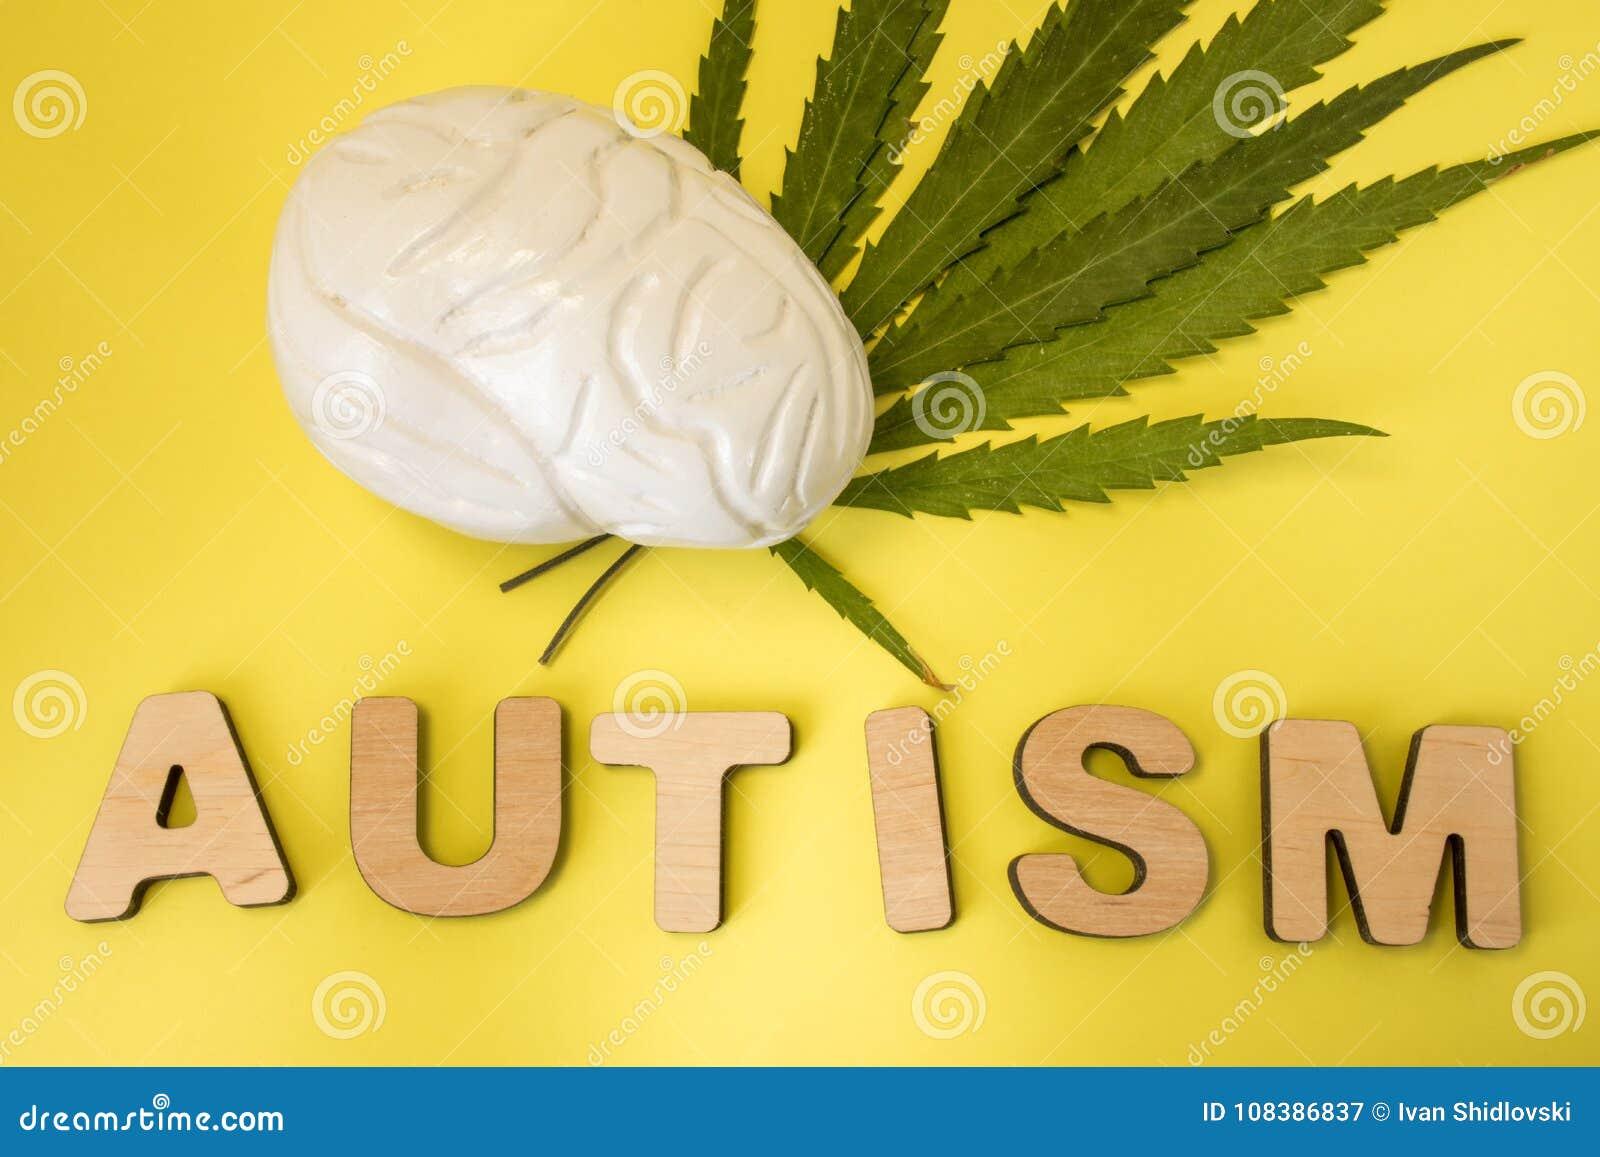 Марихуана и аутизм болезнь марихуаны фото